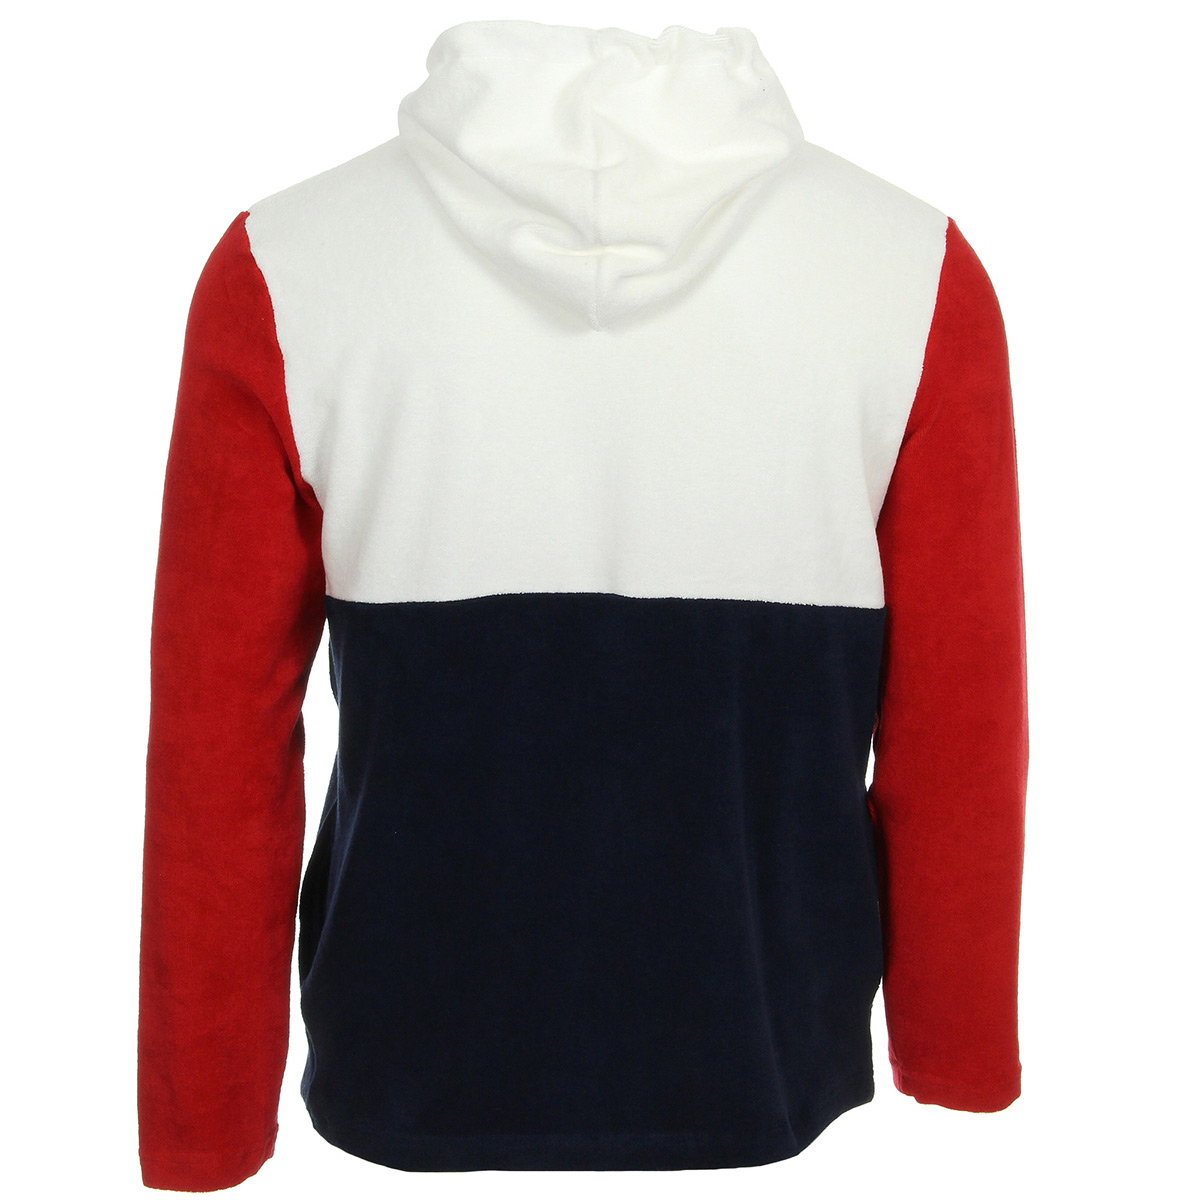 Fila Sweatshirt Lgrym/Peac/Cred 684316A17, Sweats